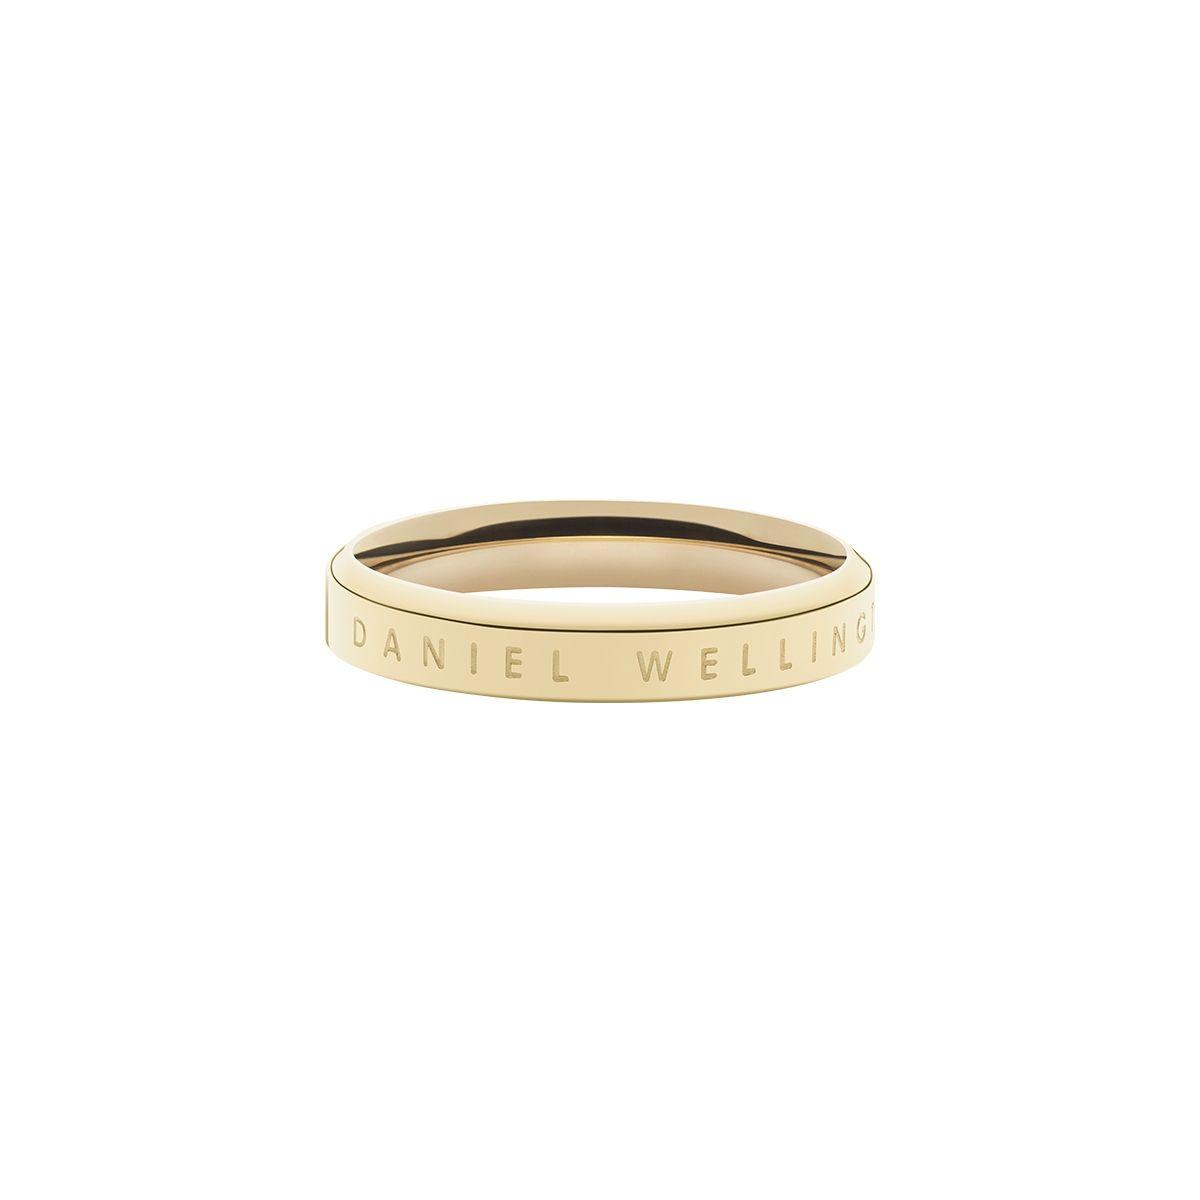 dw官网 dw手表官网 dw中国官网 dw官方旗舰店 DW DW官网  Classic Ring Gold 52mm